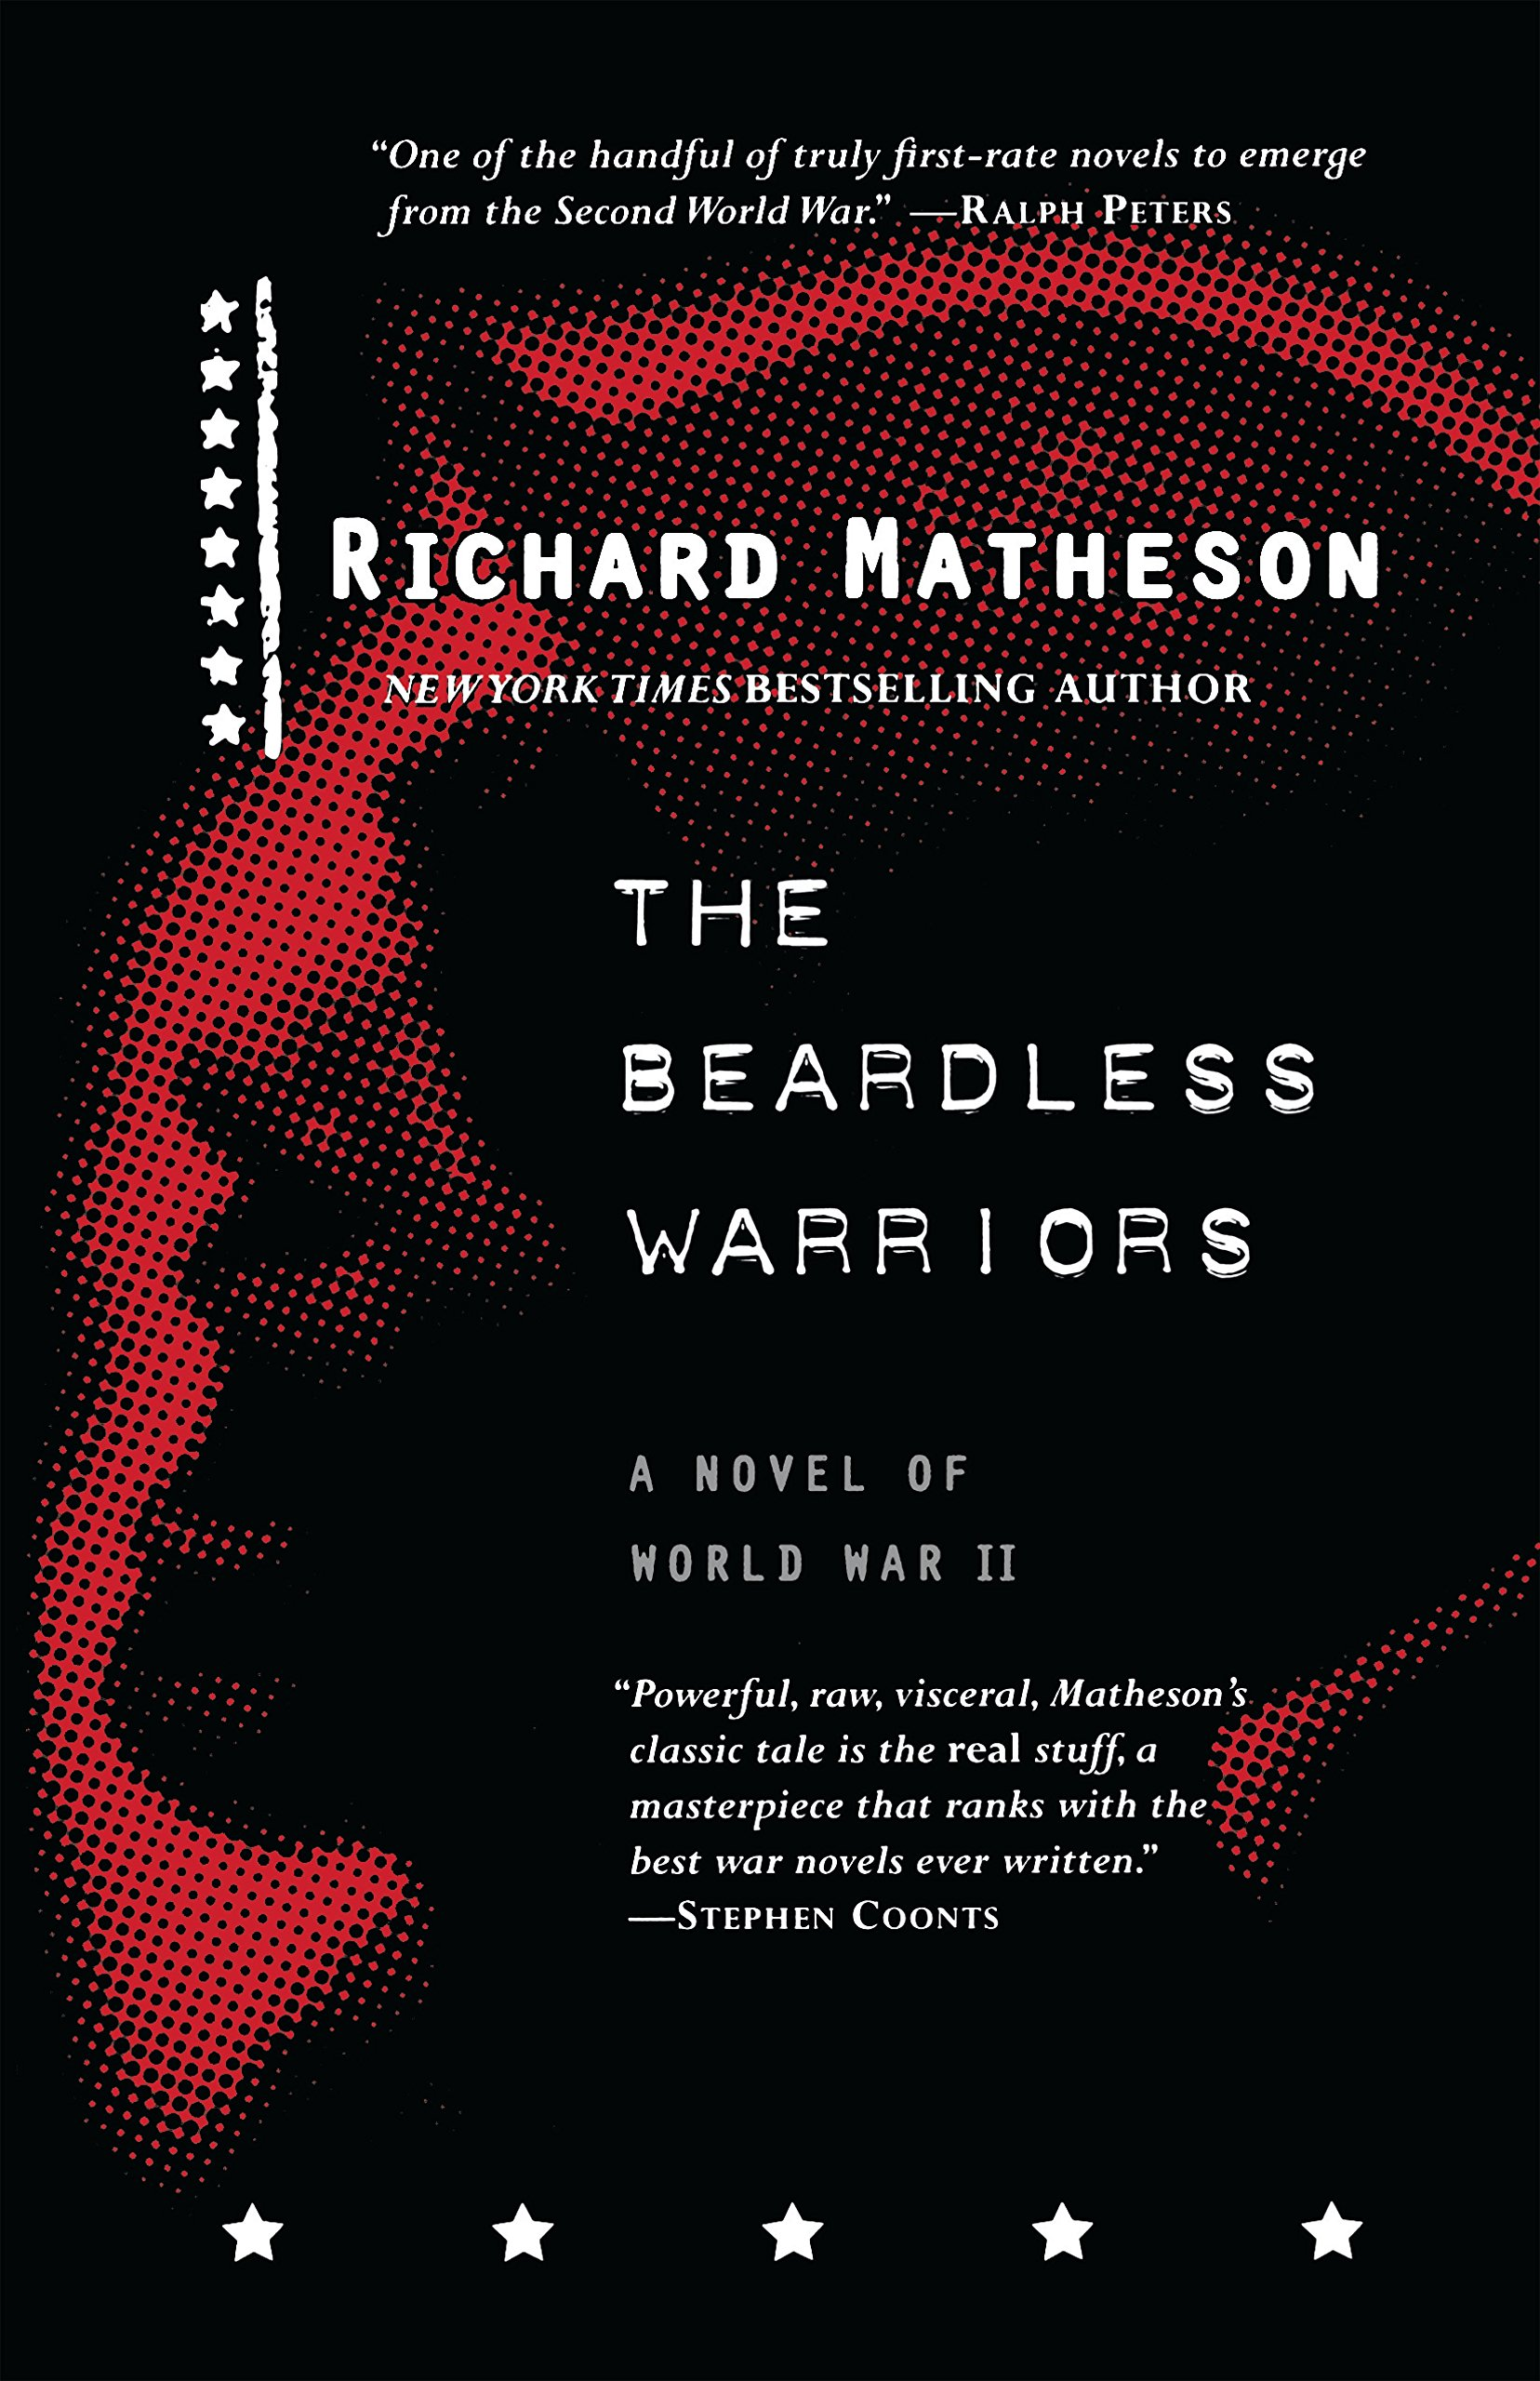 Amazon the beardless warriors a novel of world war ii amazon the beardless warriors a novel of world war ii 9780312878313 richard matheson books sciox Gallery